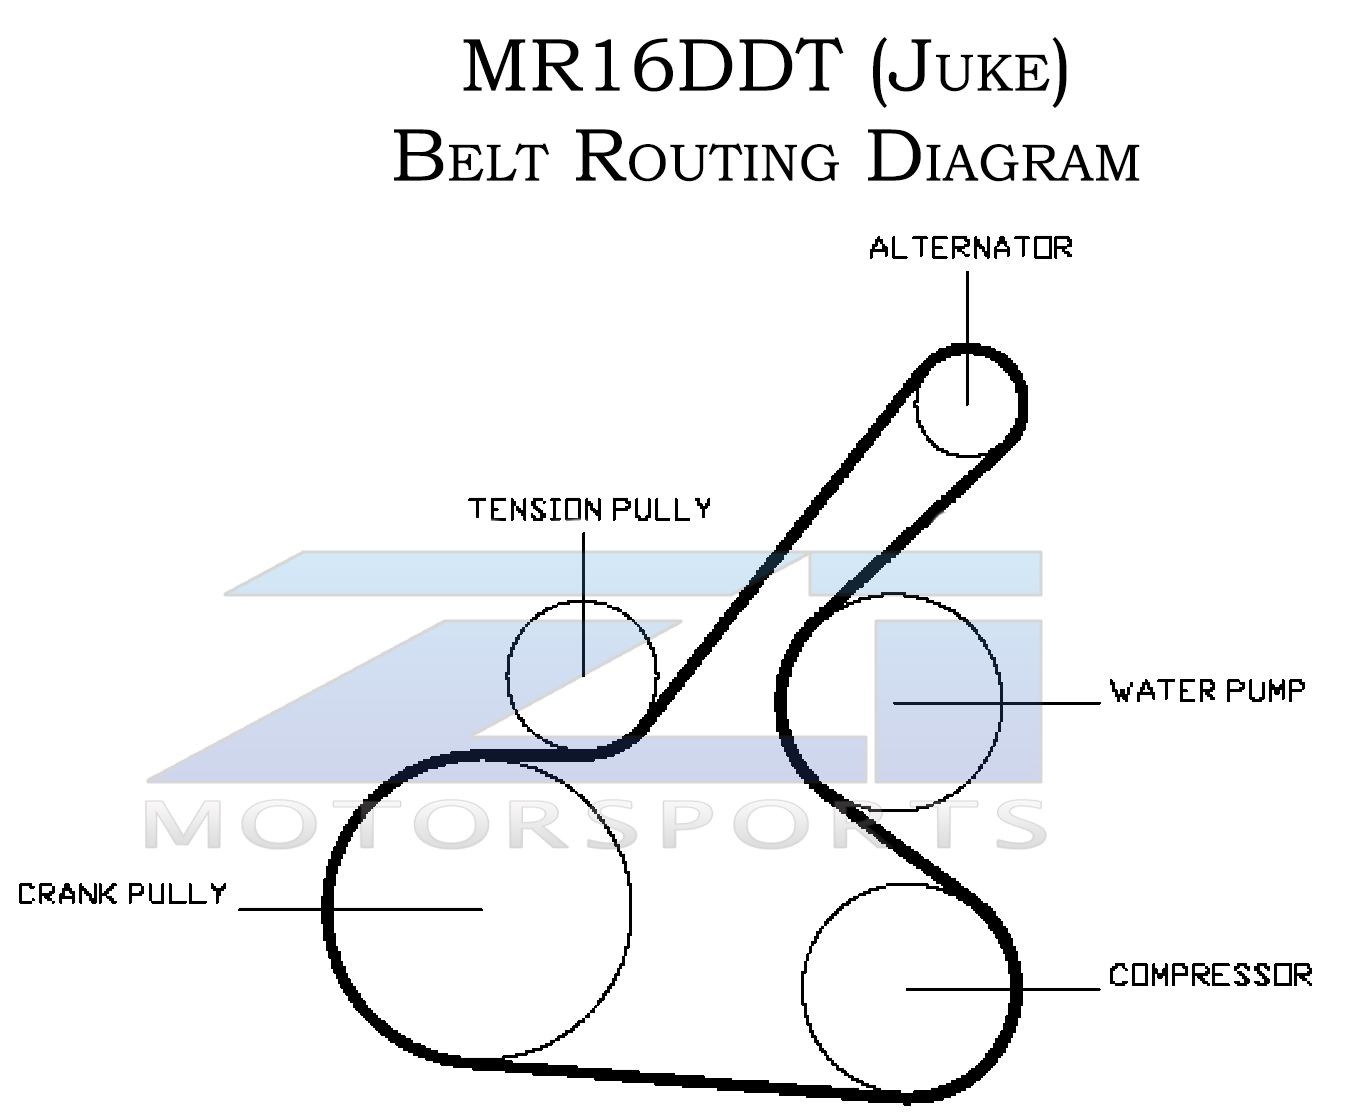 Wondrous Juke Belt Diagram Wiring Diagram Data Wiring Cloud Hemtegremohammedshrineorg